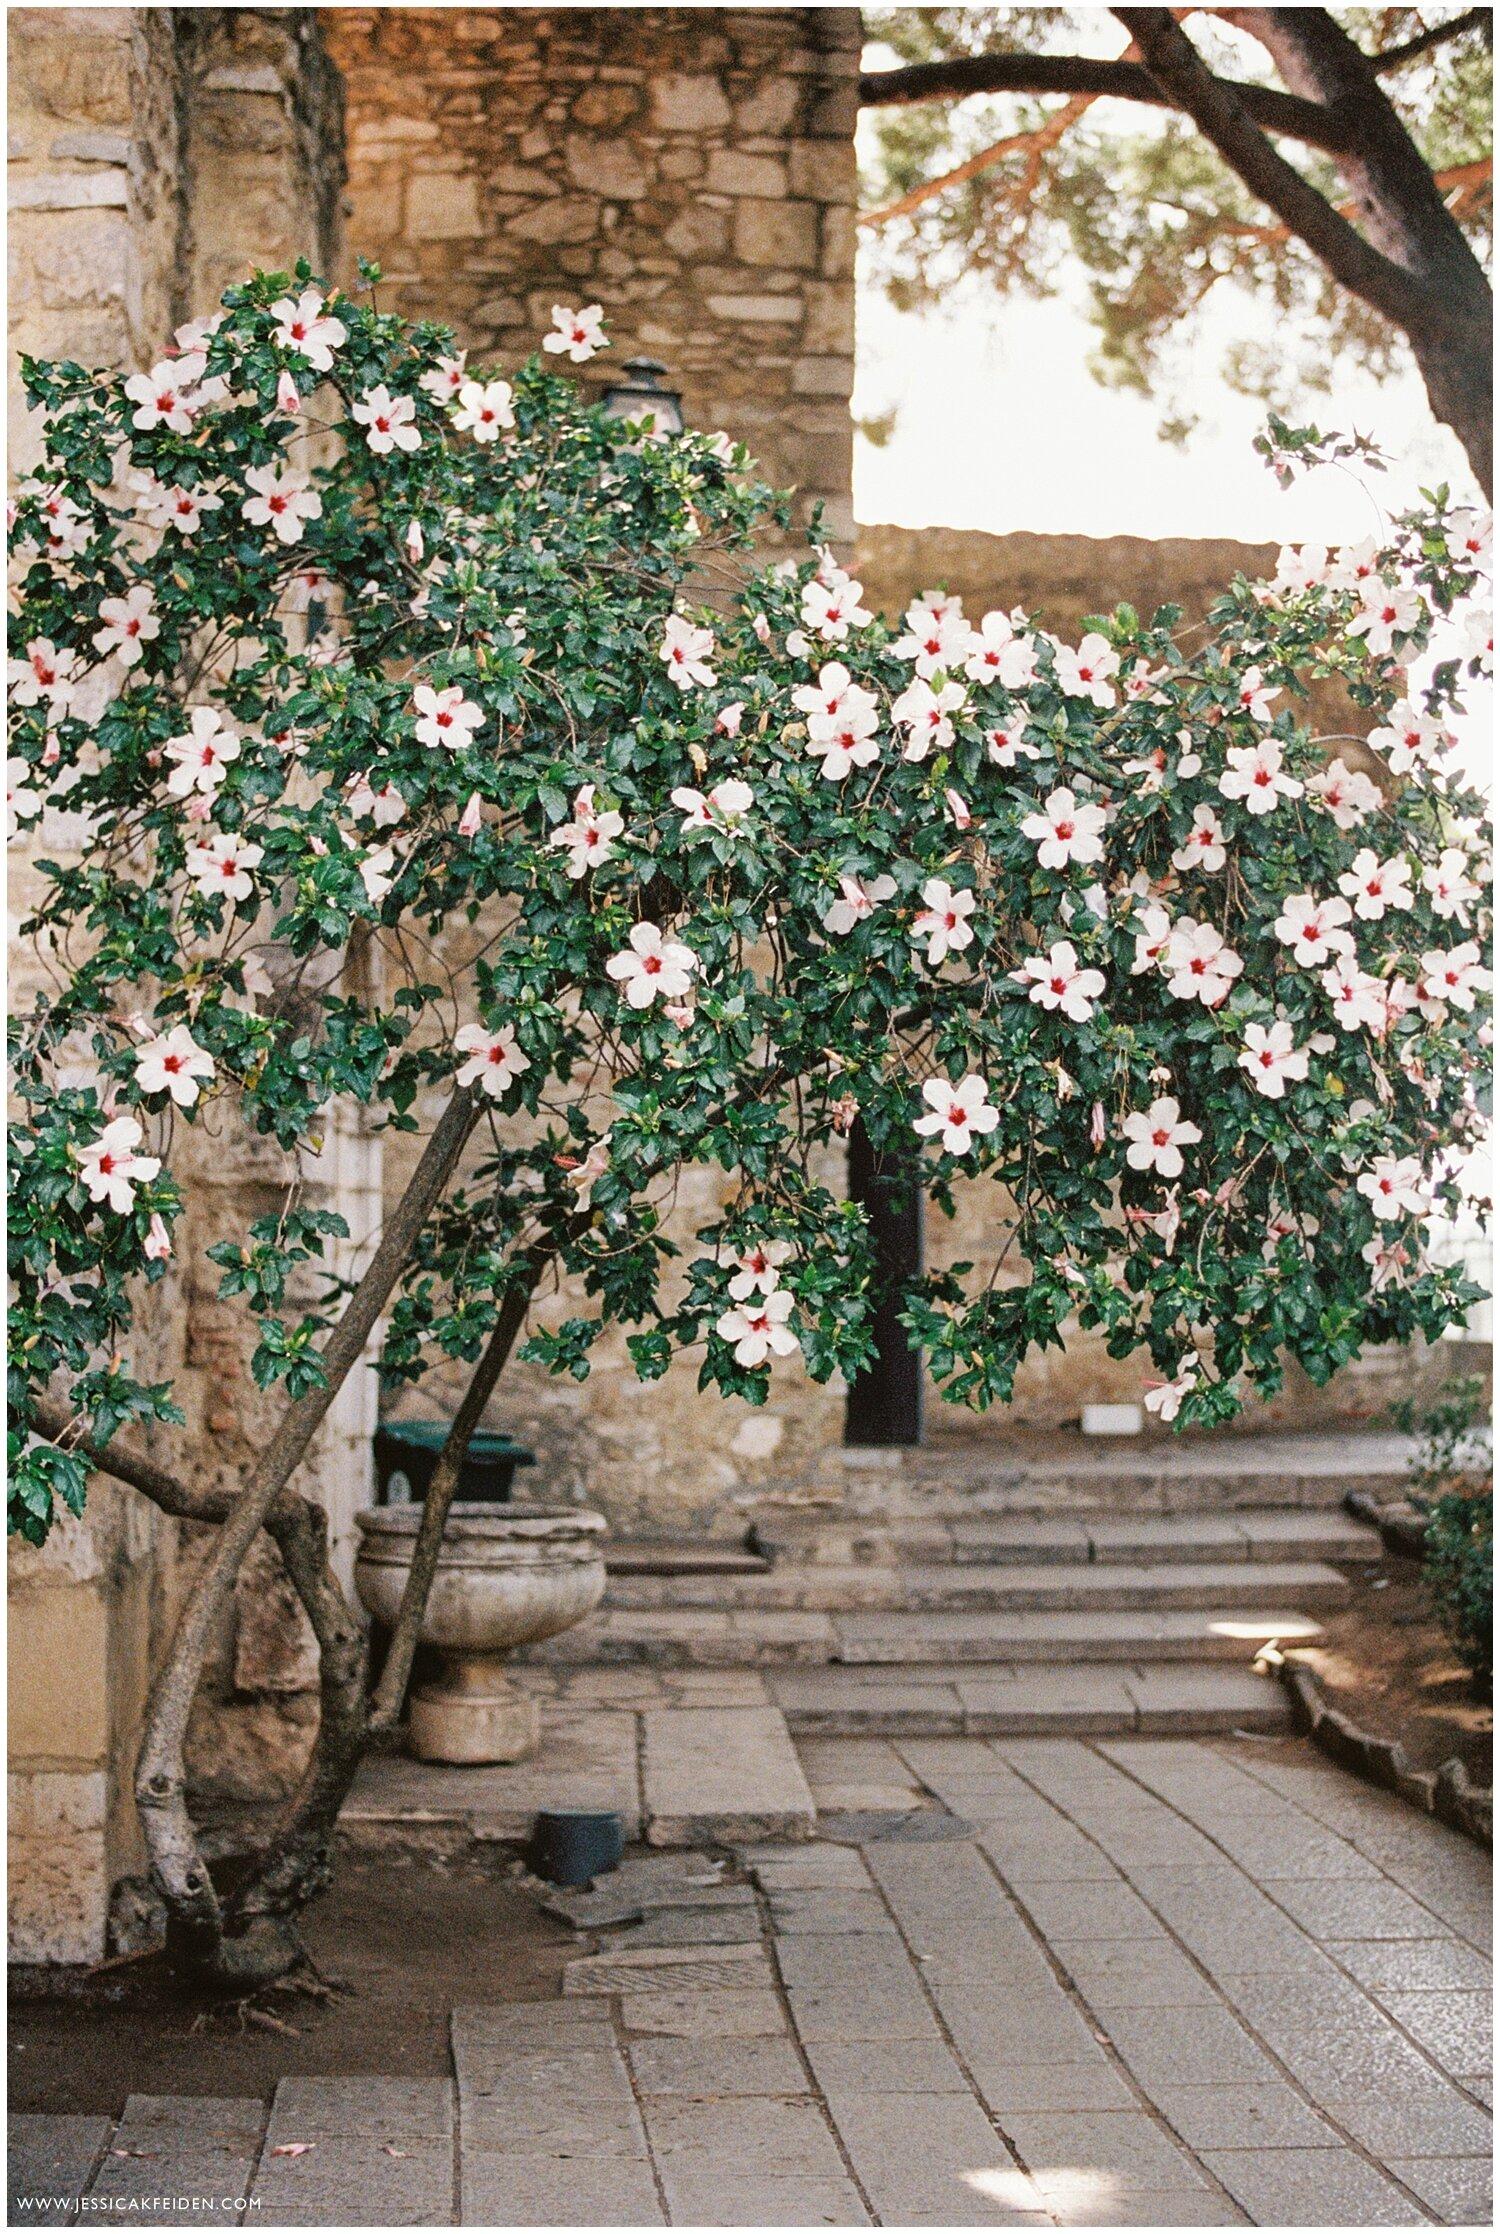 Jessica K Feiden Photography_Portugal Film Photographer_Portugal Travel Photographs_0019.jpg